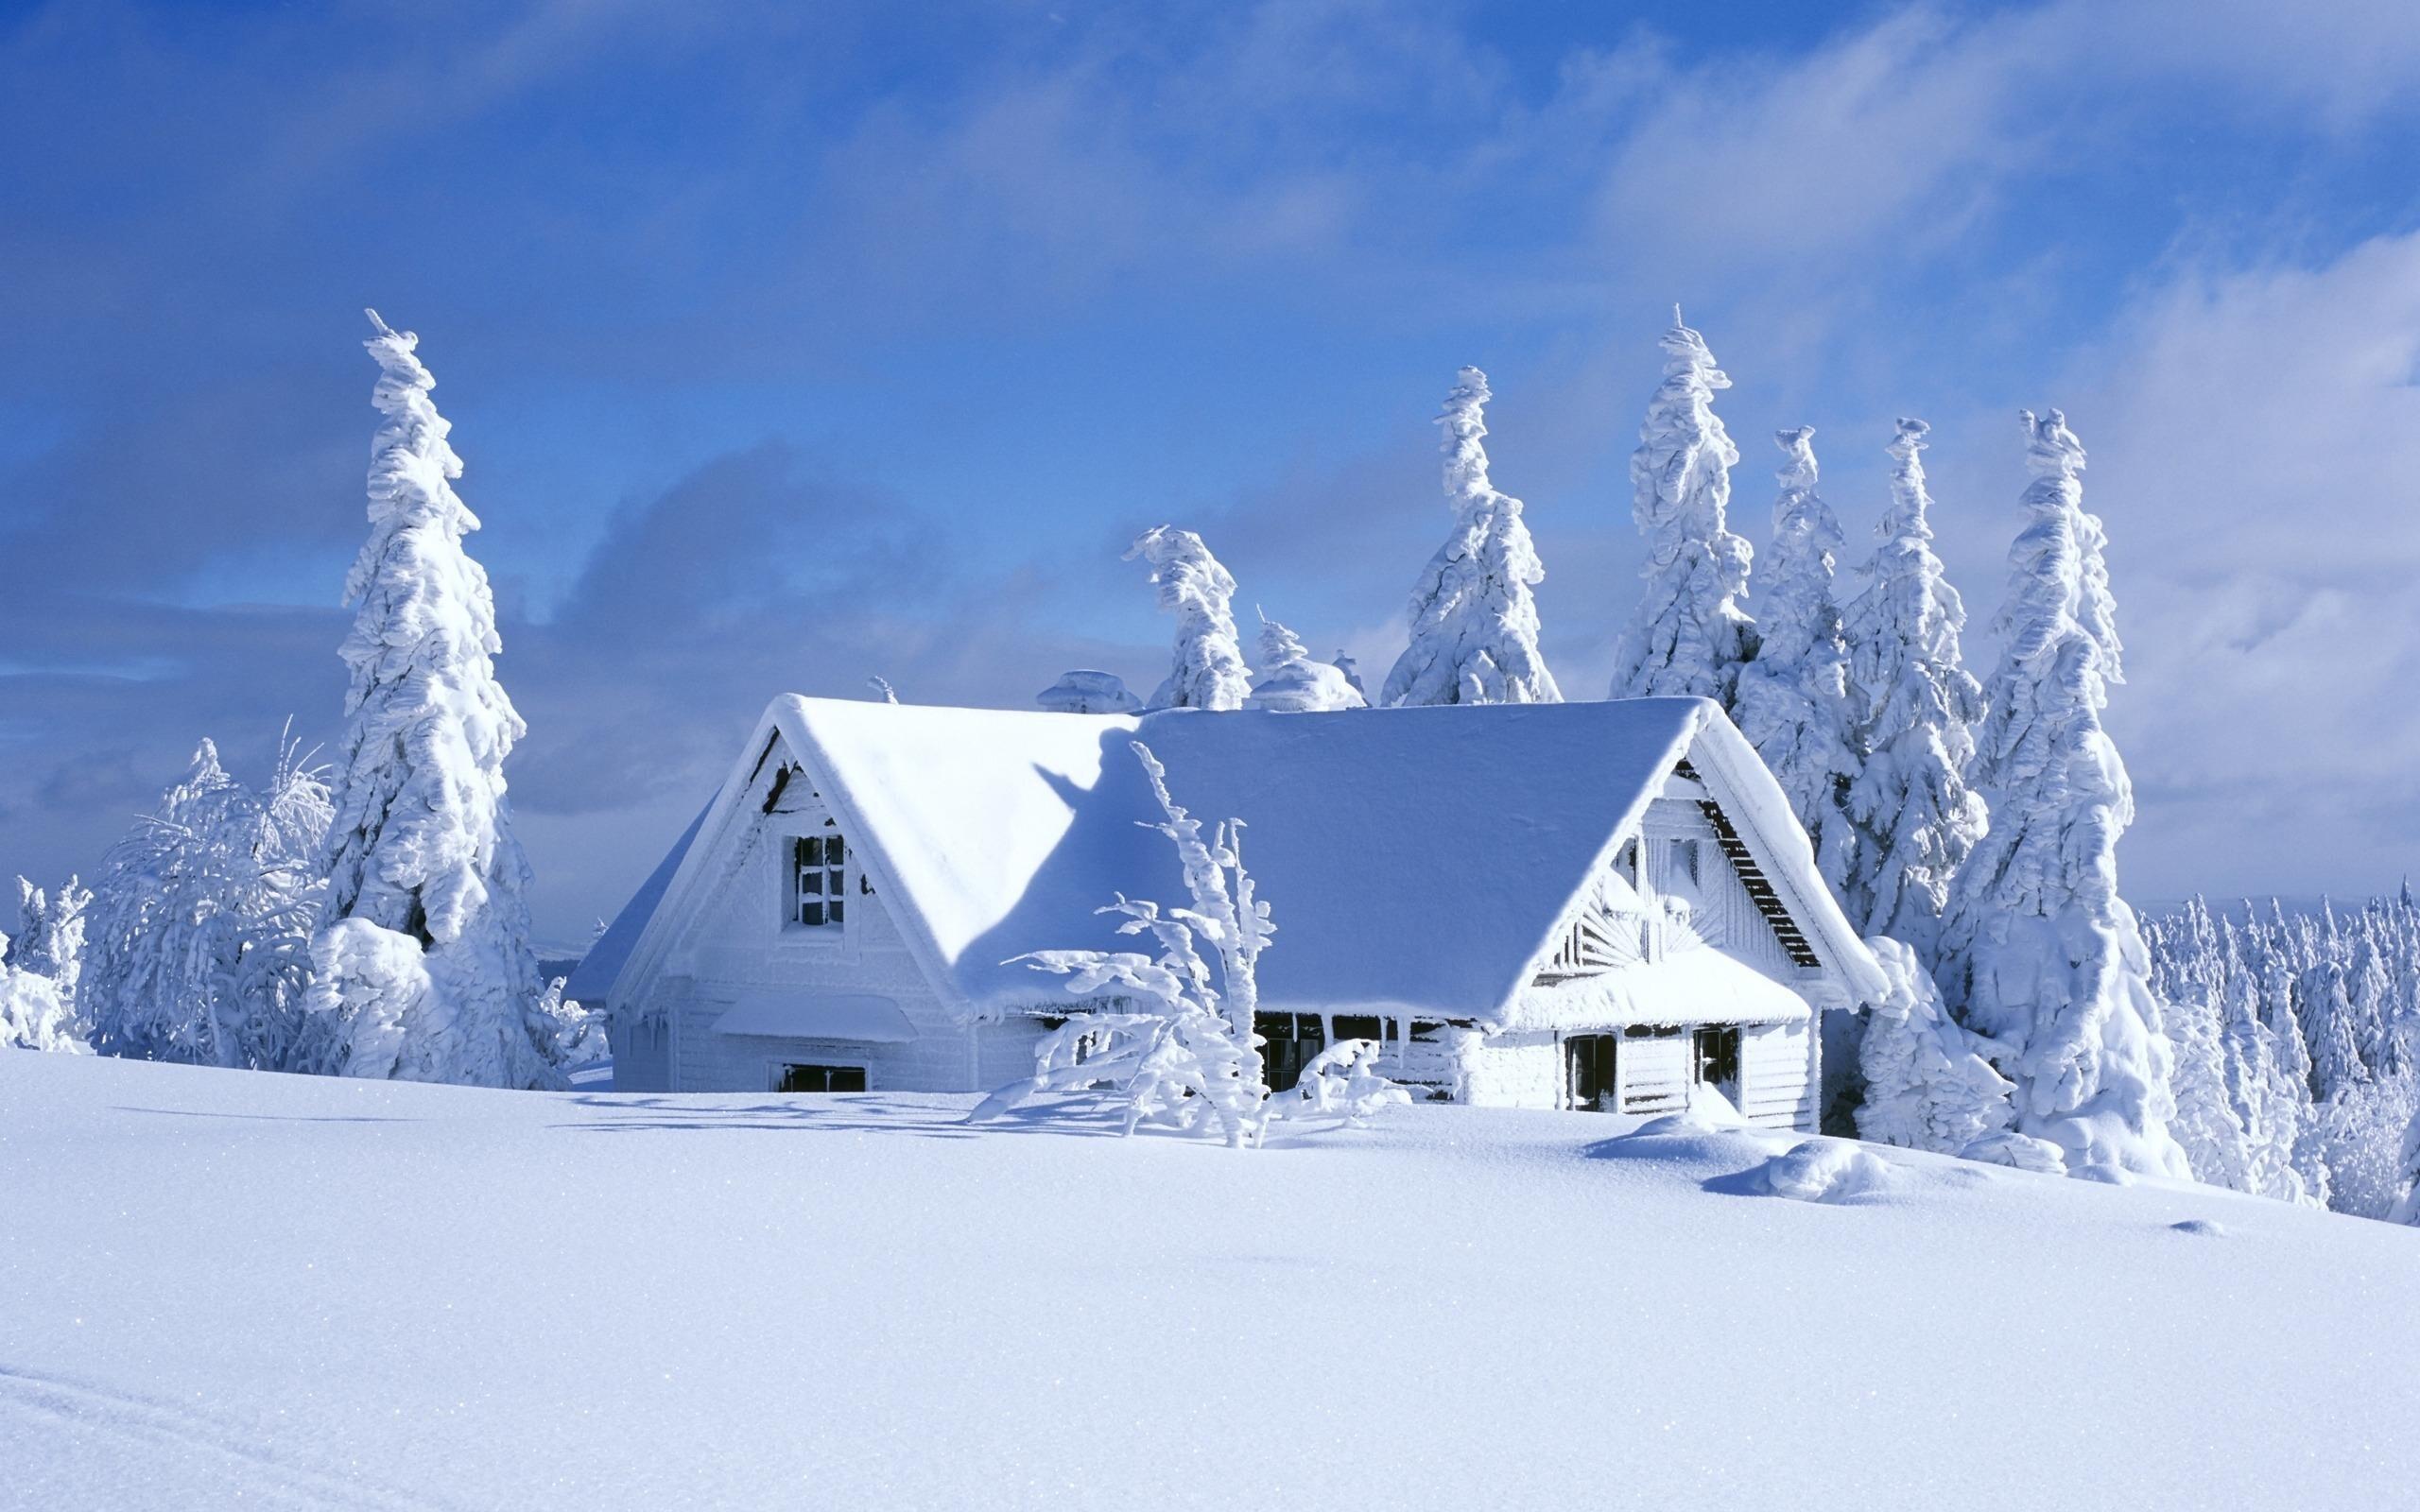 Beautiful Snowy Home In Winter